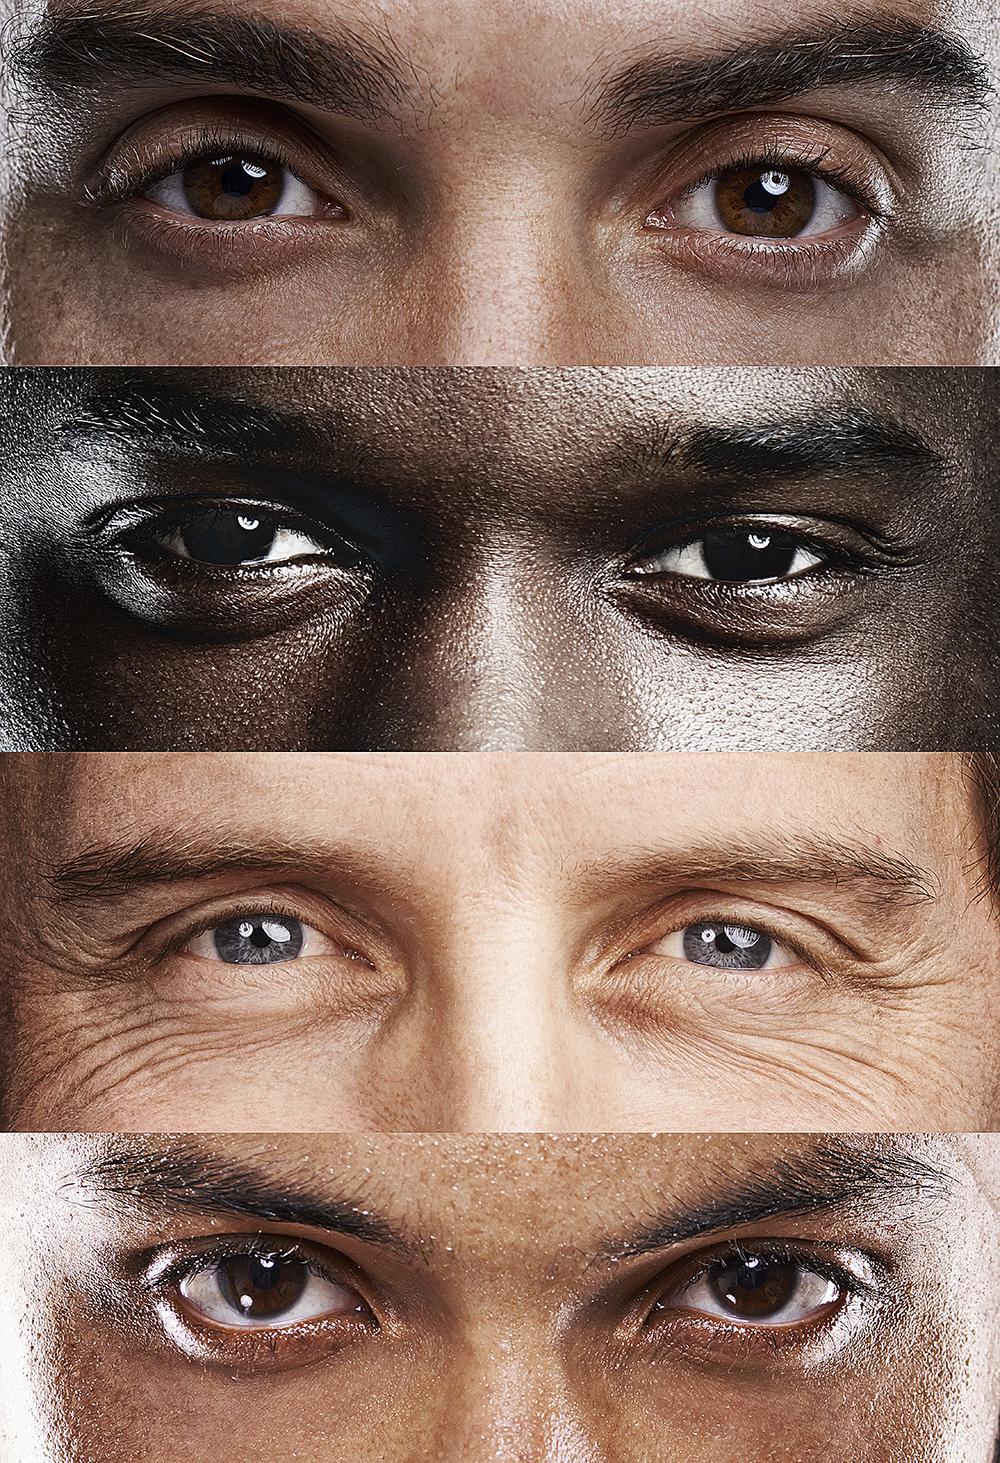 eye diversity